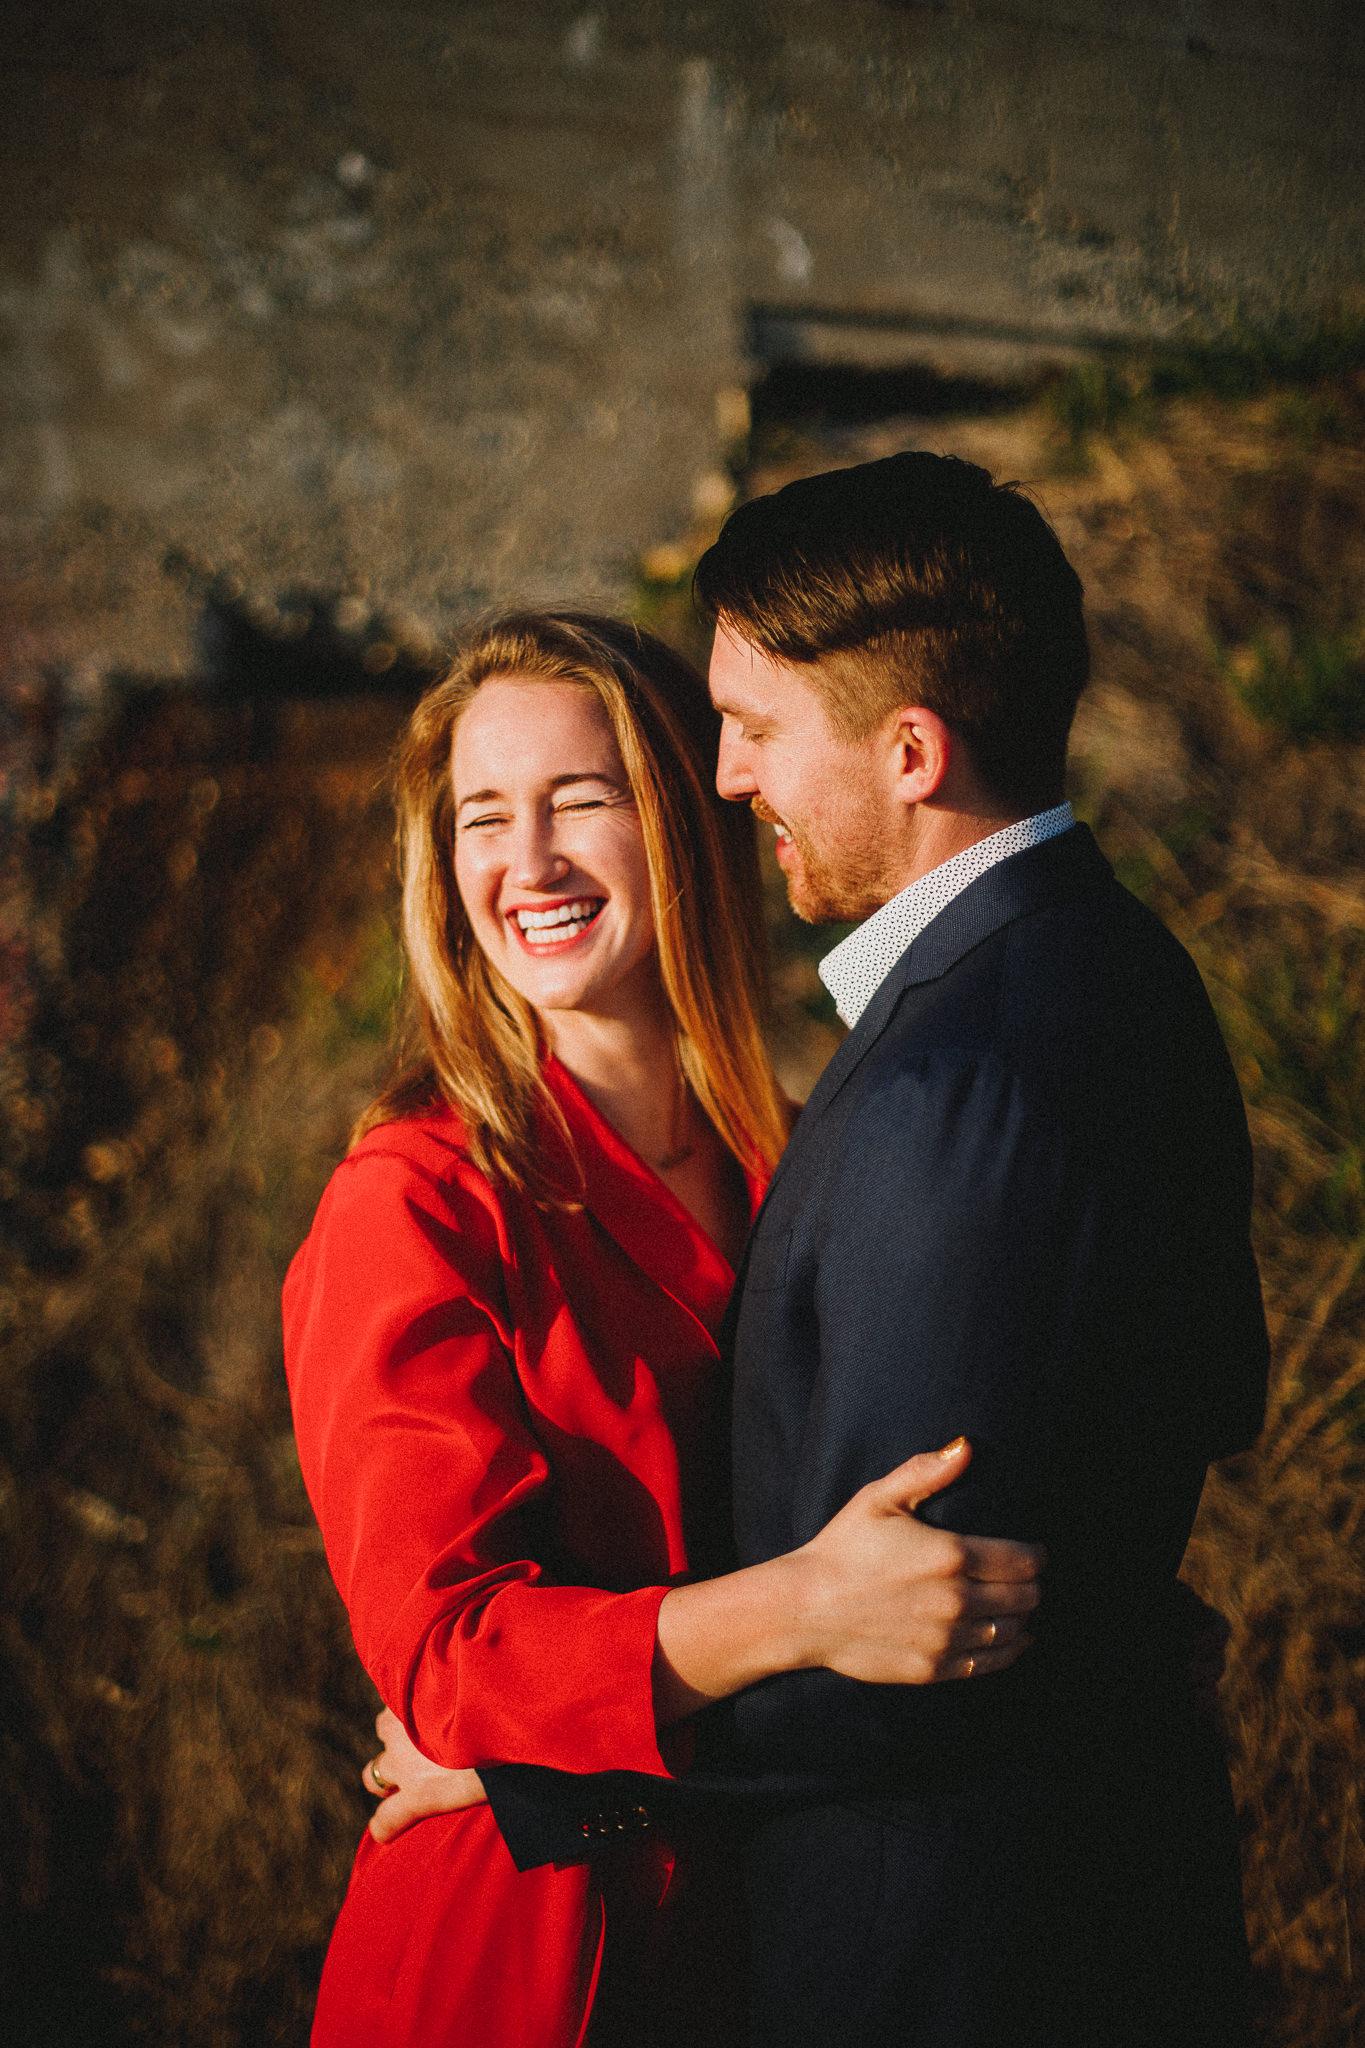 Archer Inspired Photography Carmel Beach California Wedding Engagement Lifestyle Anniversary Natural Light Photographer-5.jpg